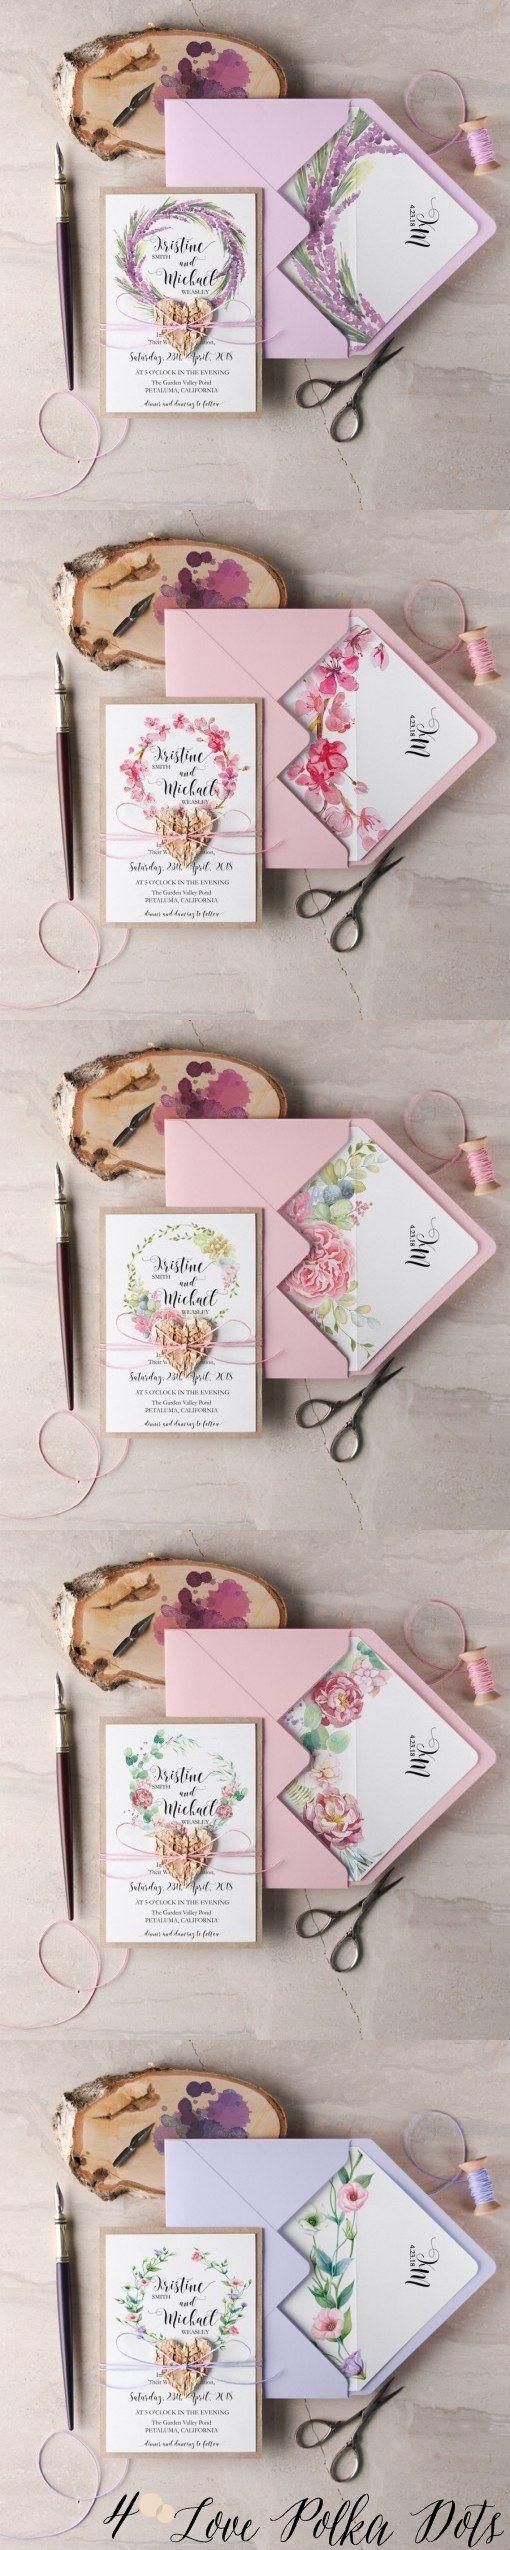 Pink watercolor wedding invitations #pinkwedding #floralwedding #lilacwedding